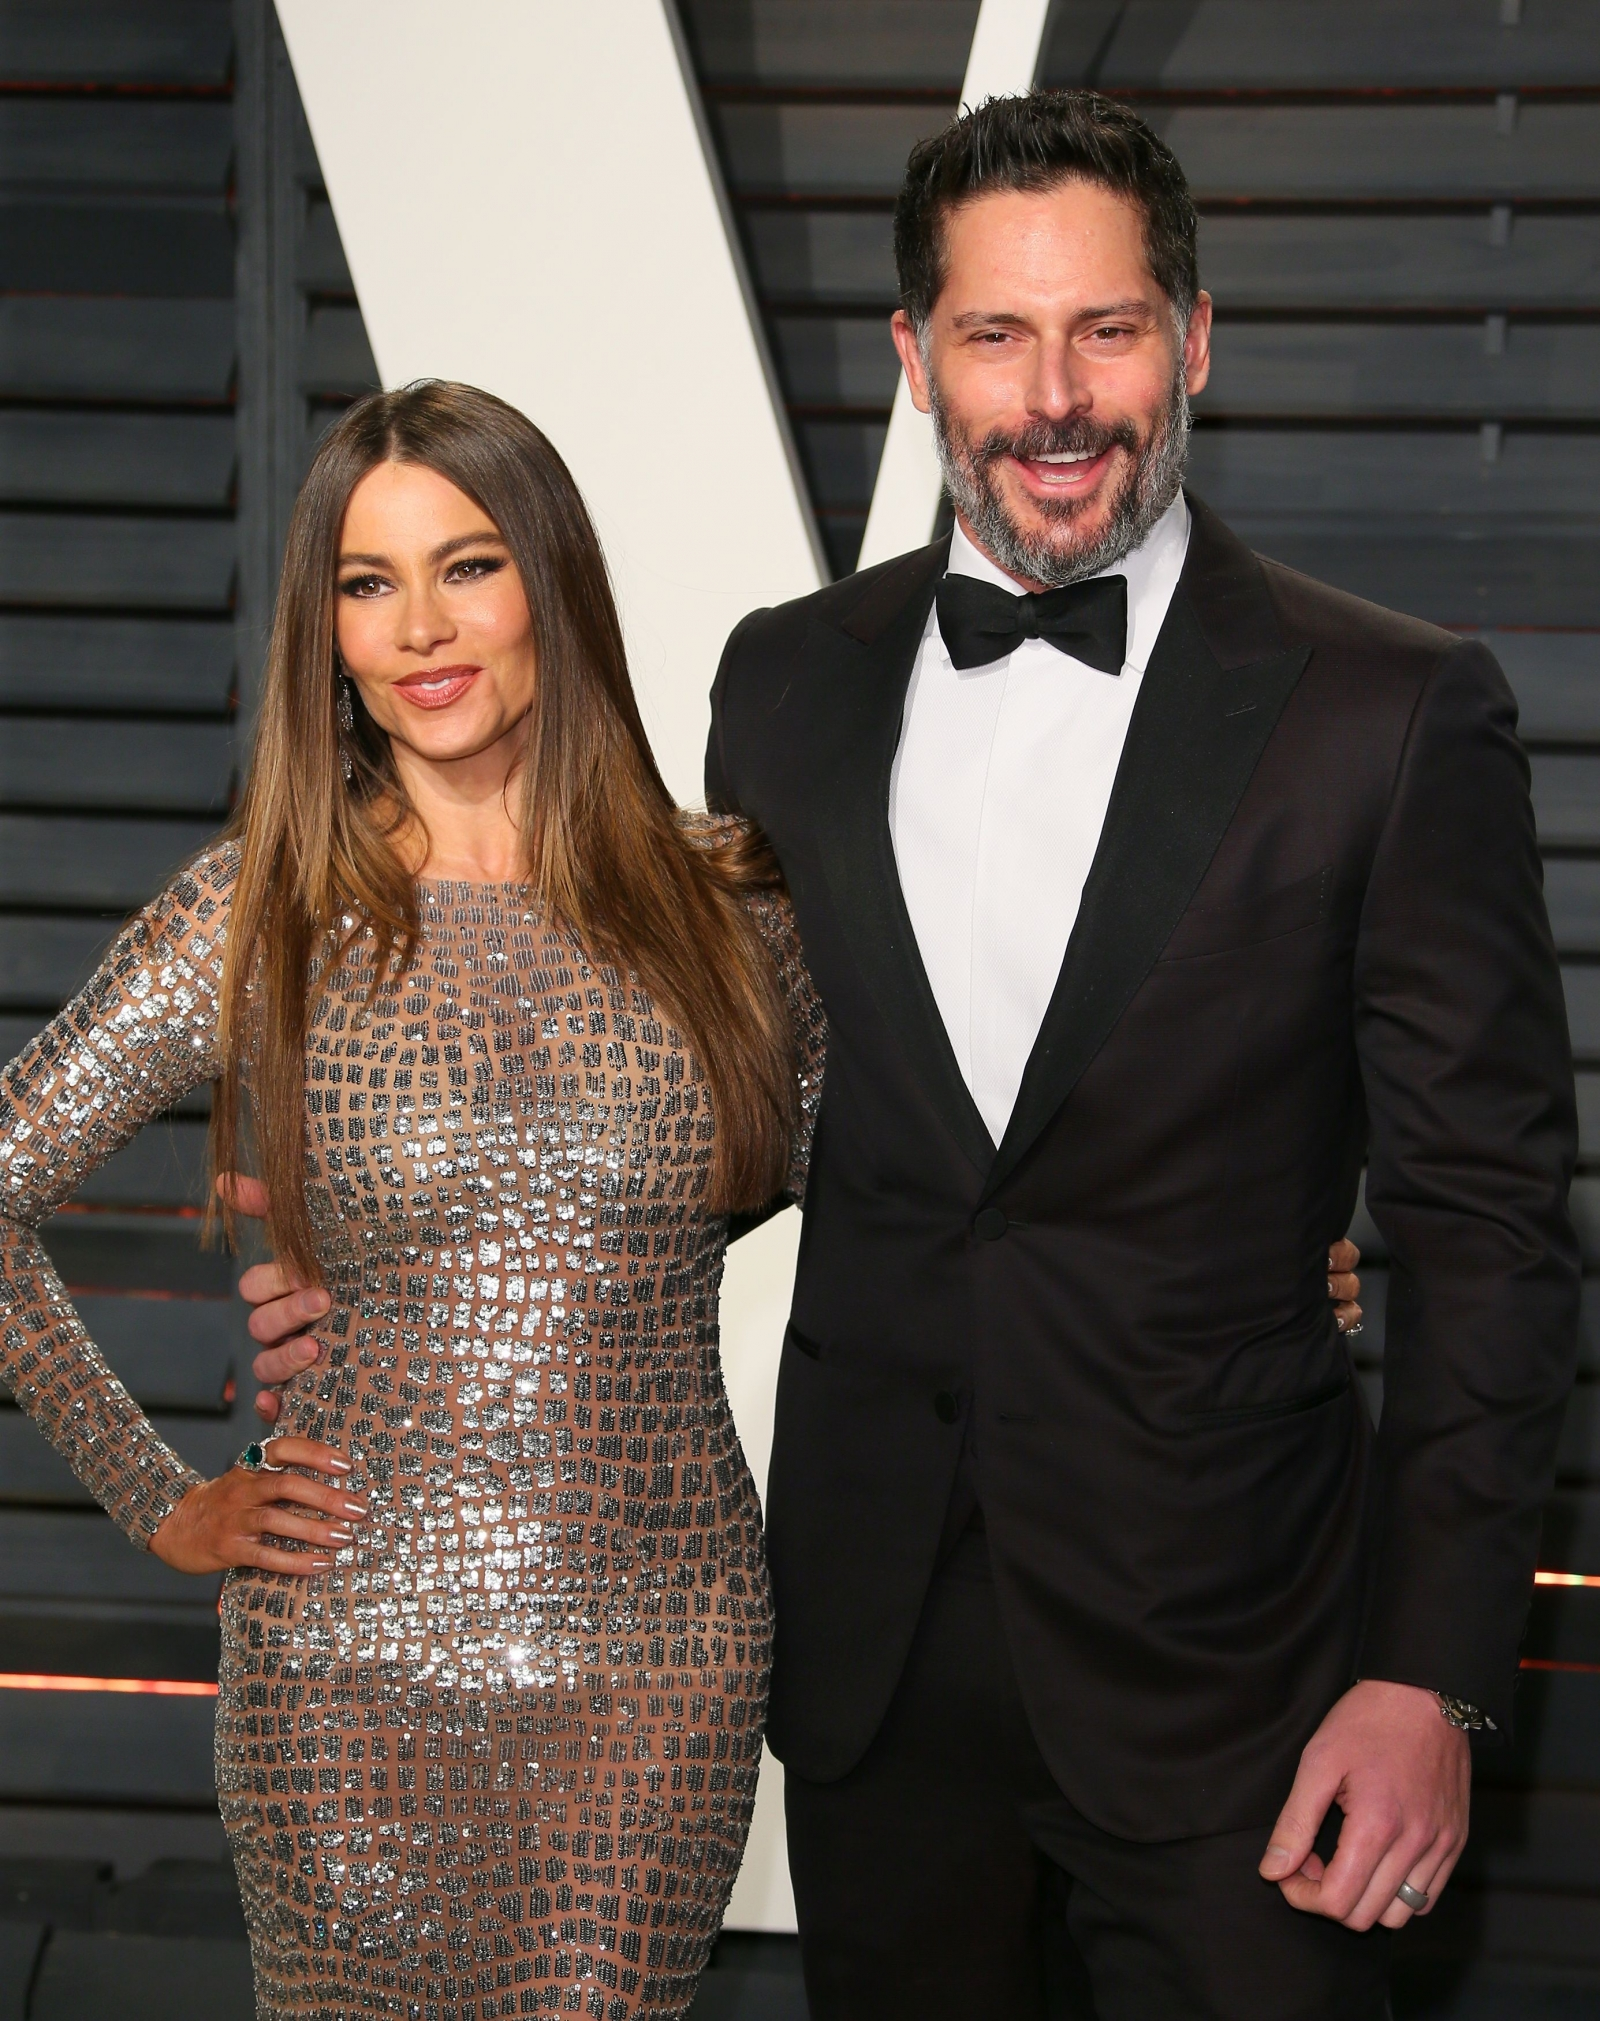 Sofia Vergara Blasts Tabloid For 'Fake' Report Of Divorce From Joe Manganiello